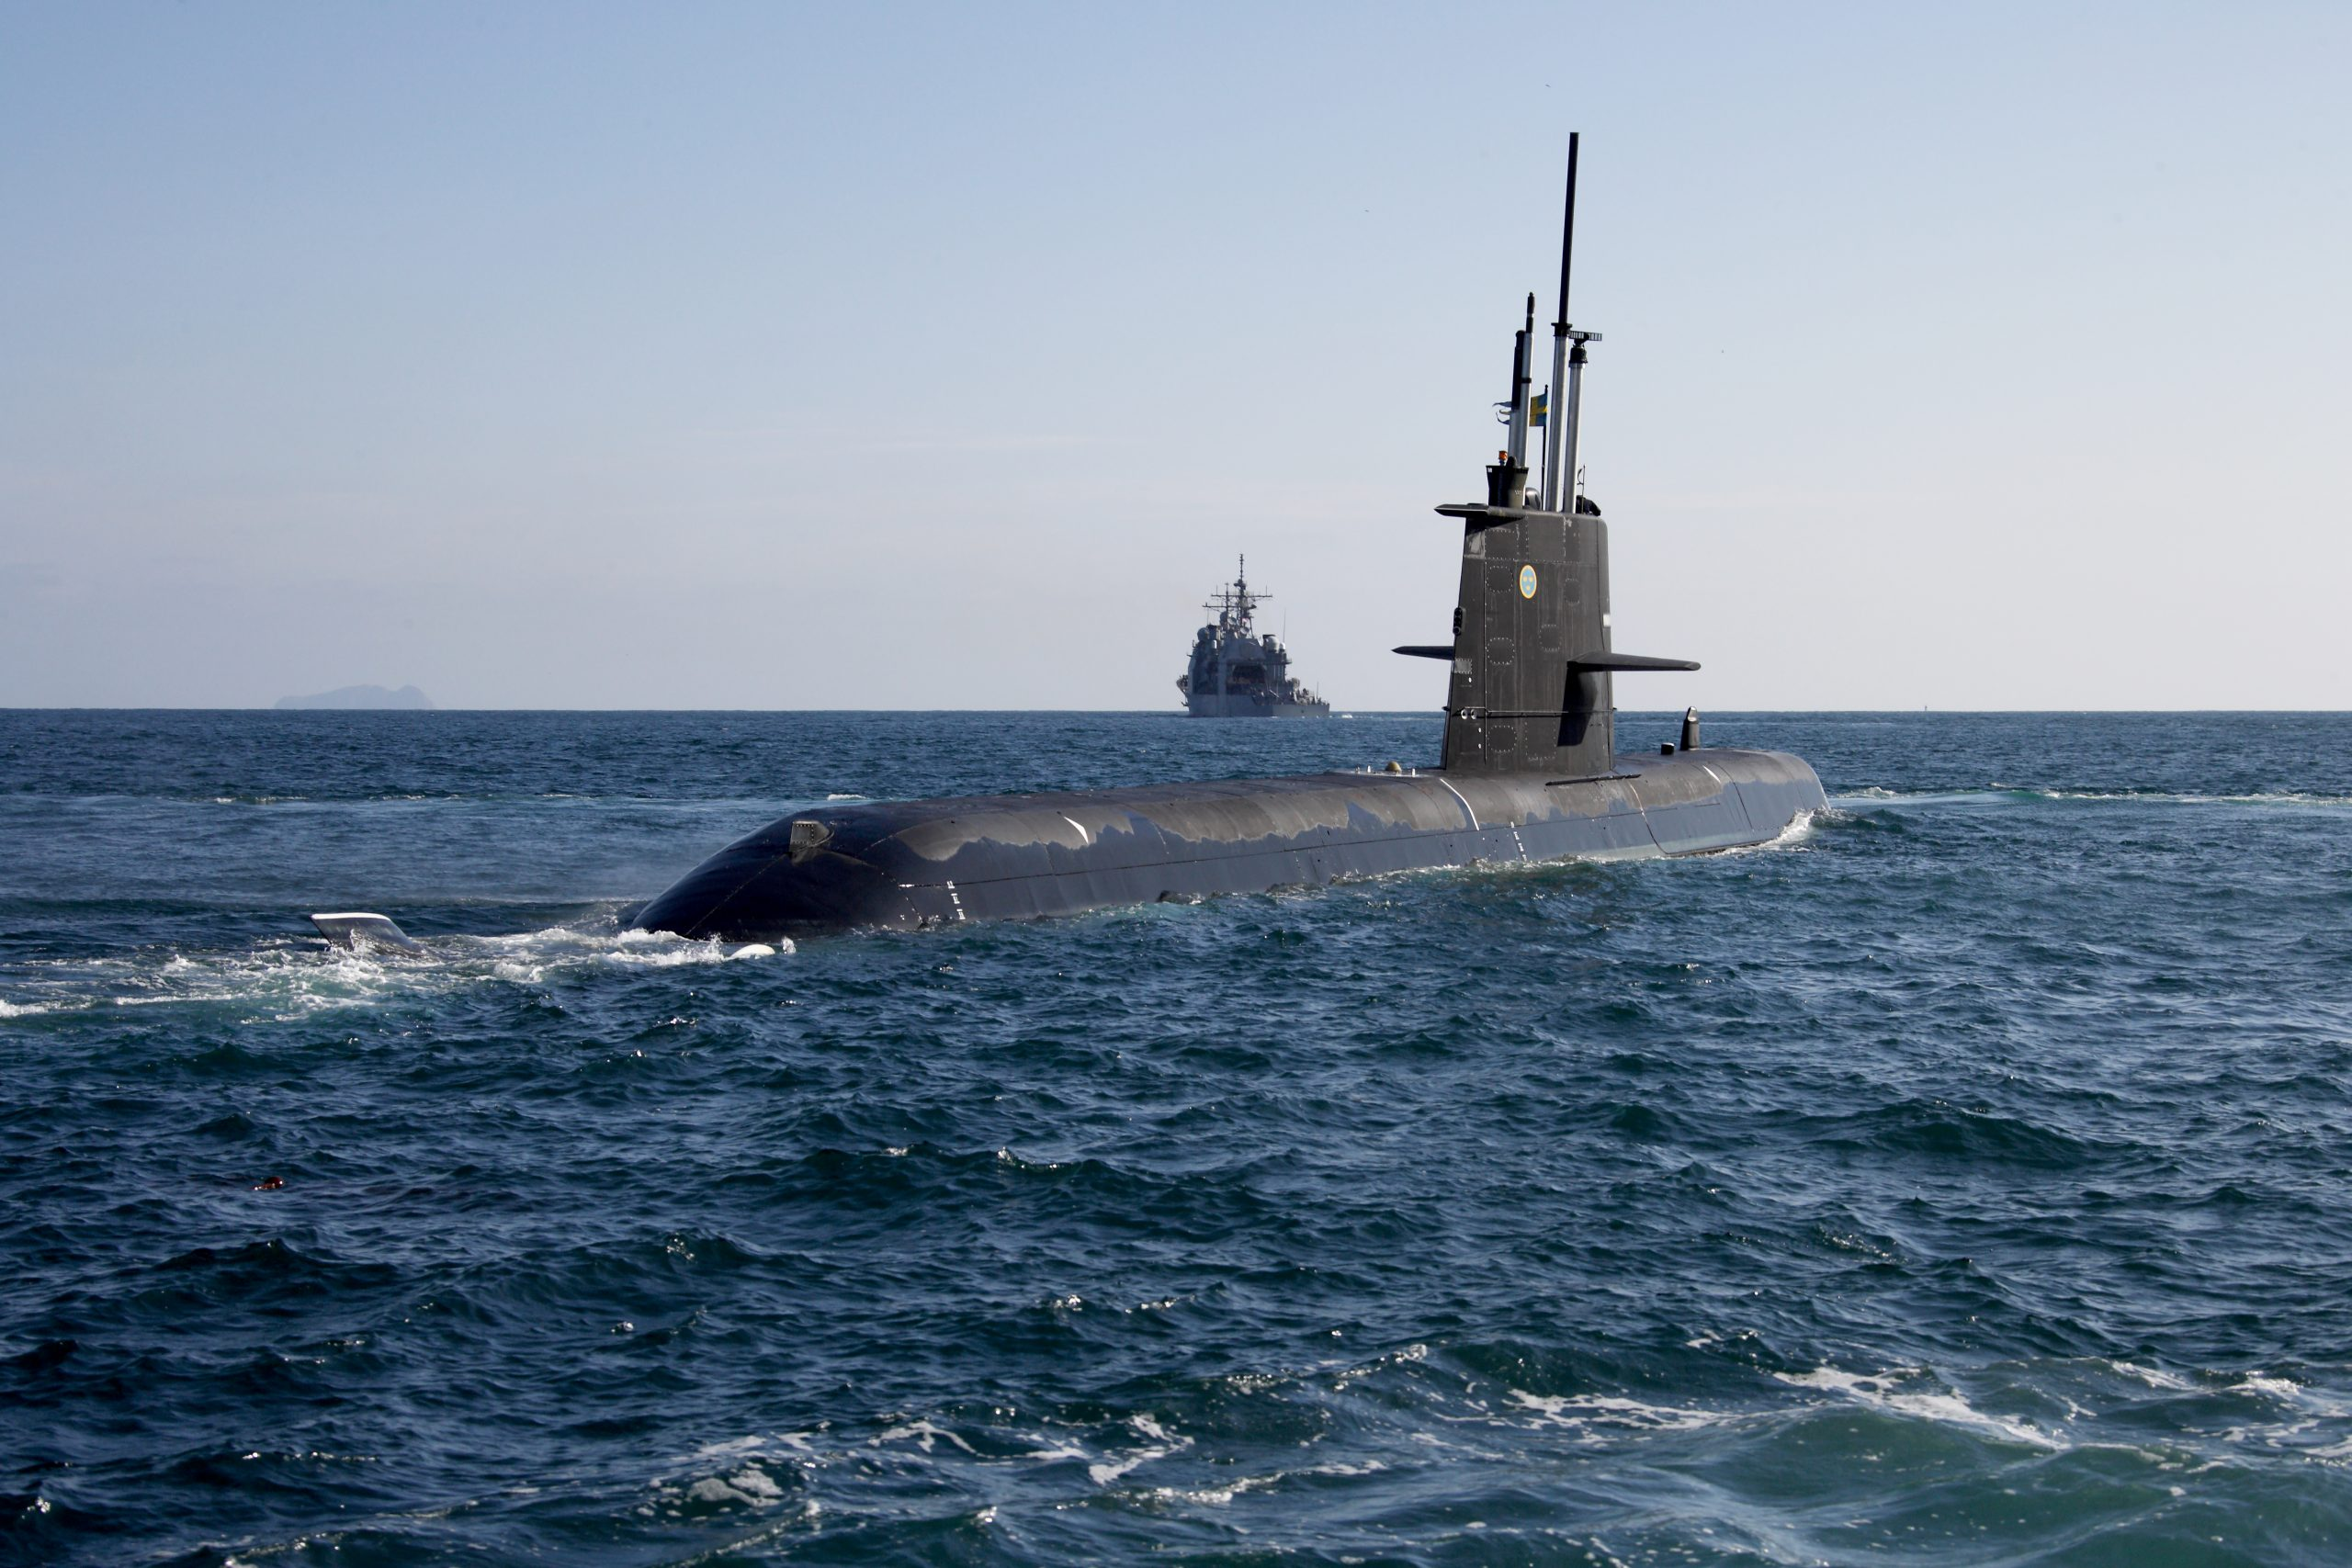 Swedish Royal Navy Gotland-class submarine